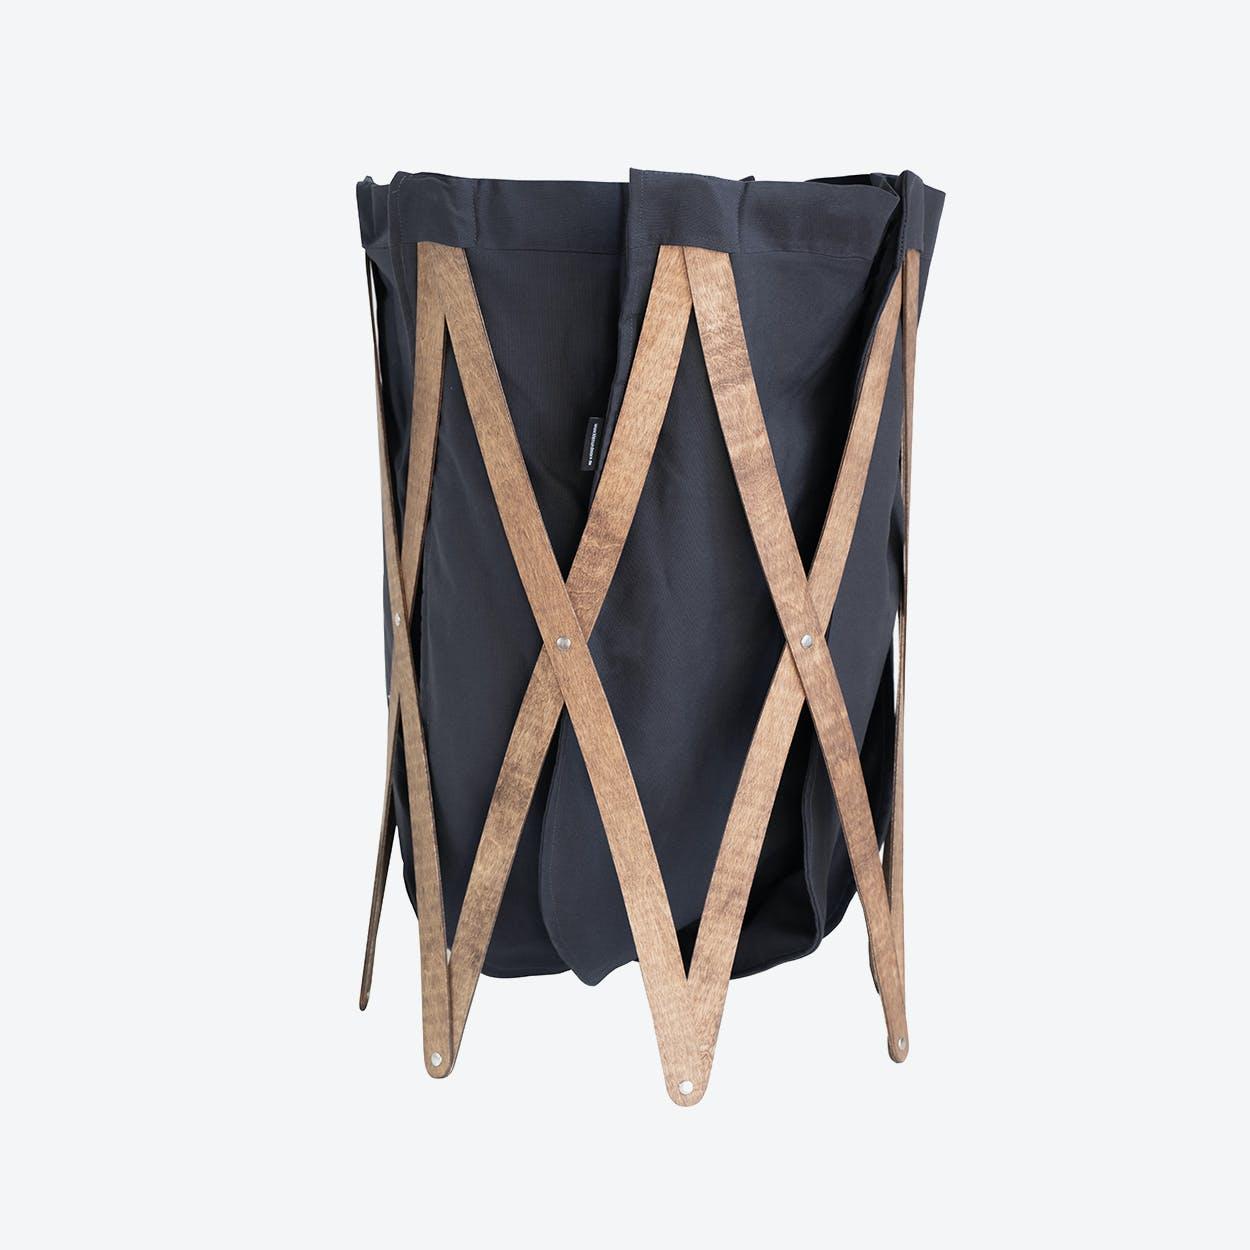 Marie Pi Laundry Basket in Navy/Walnut